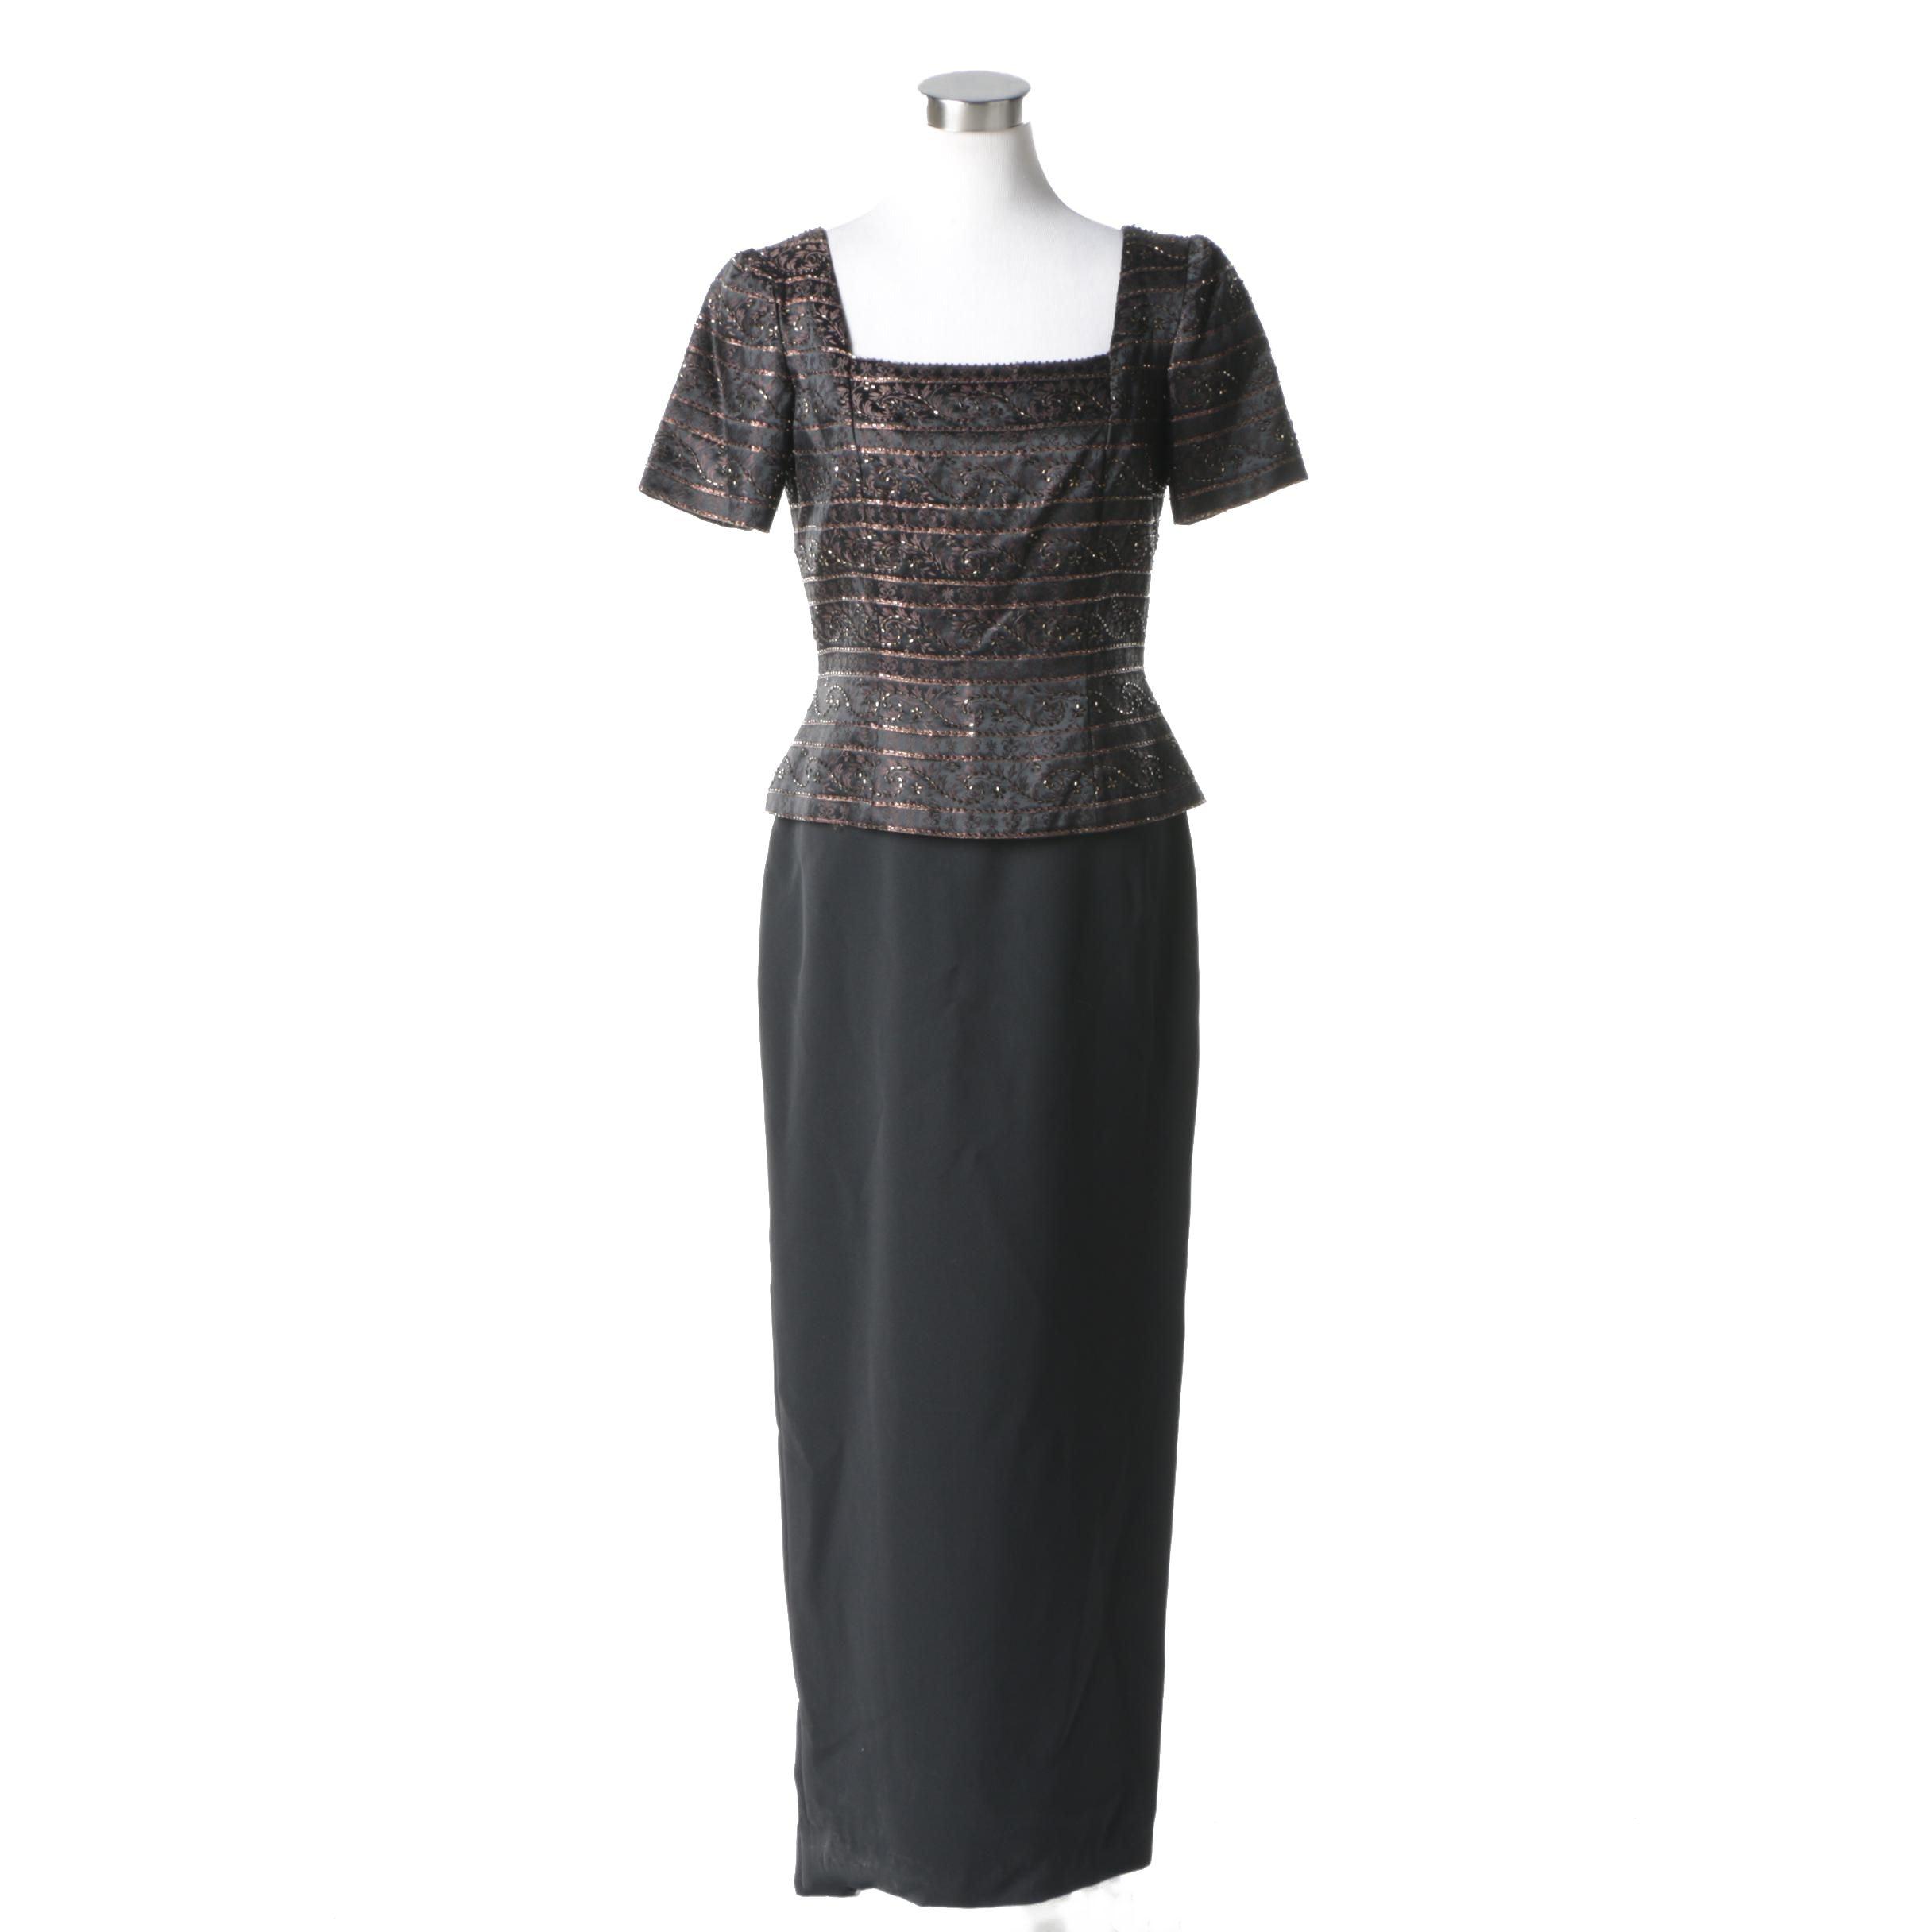 Marie St. Claire Evening Dress